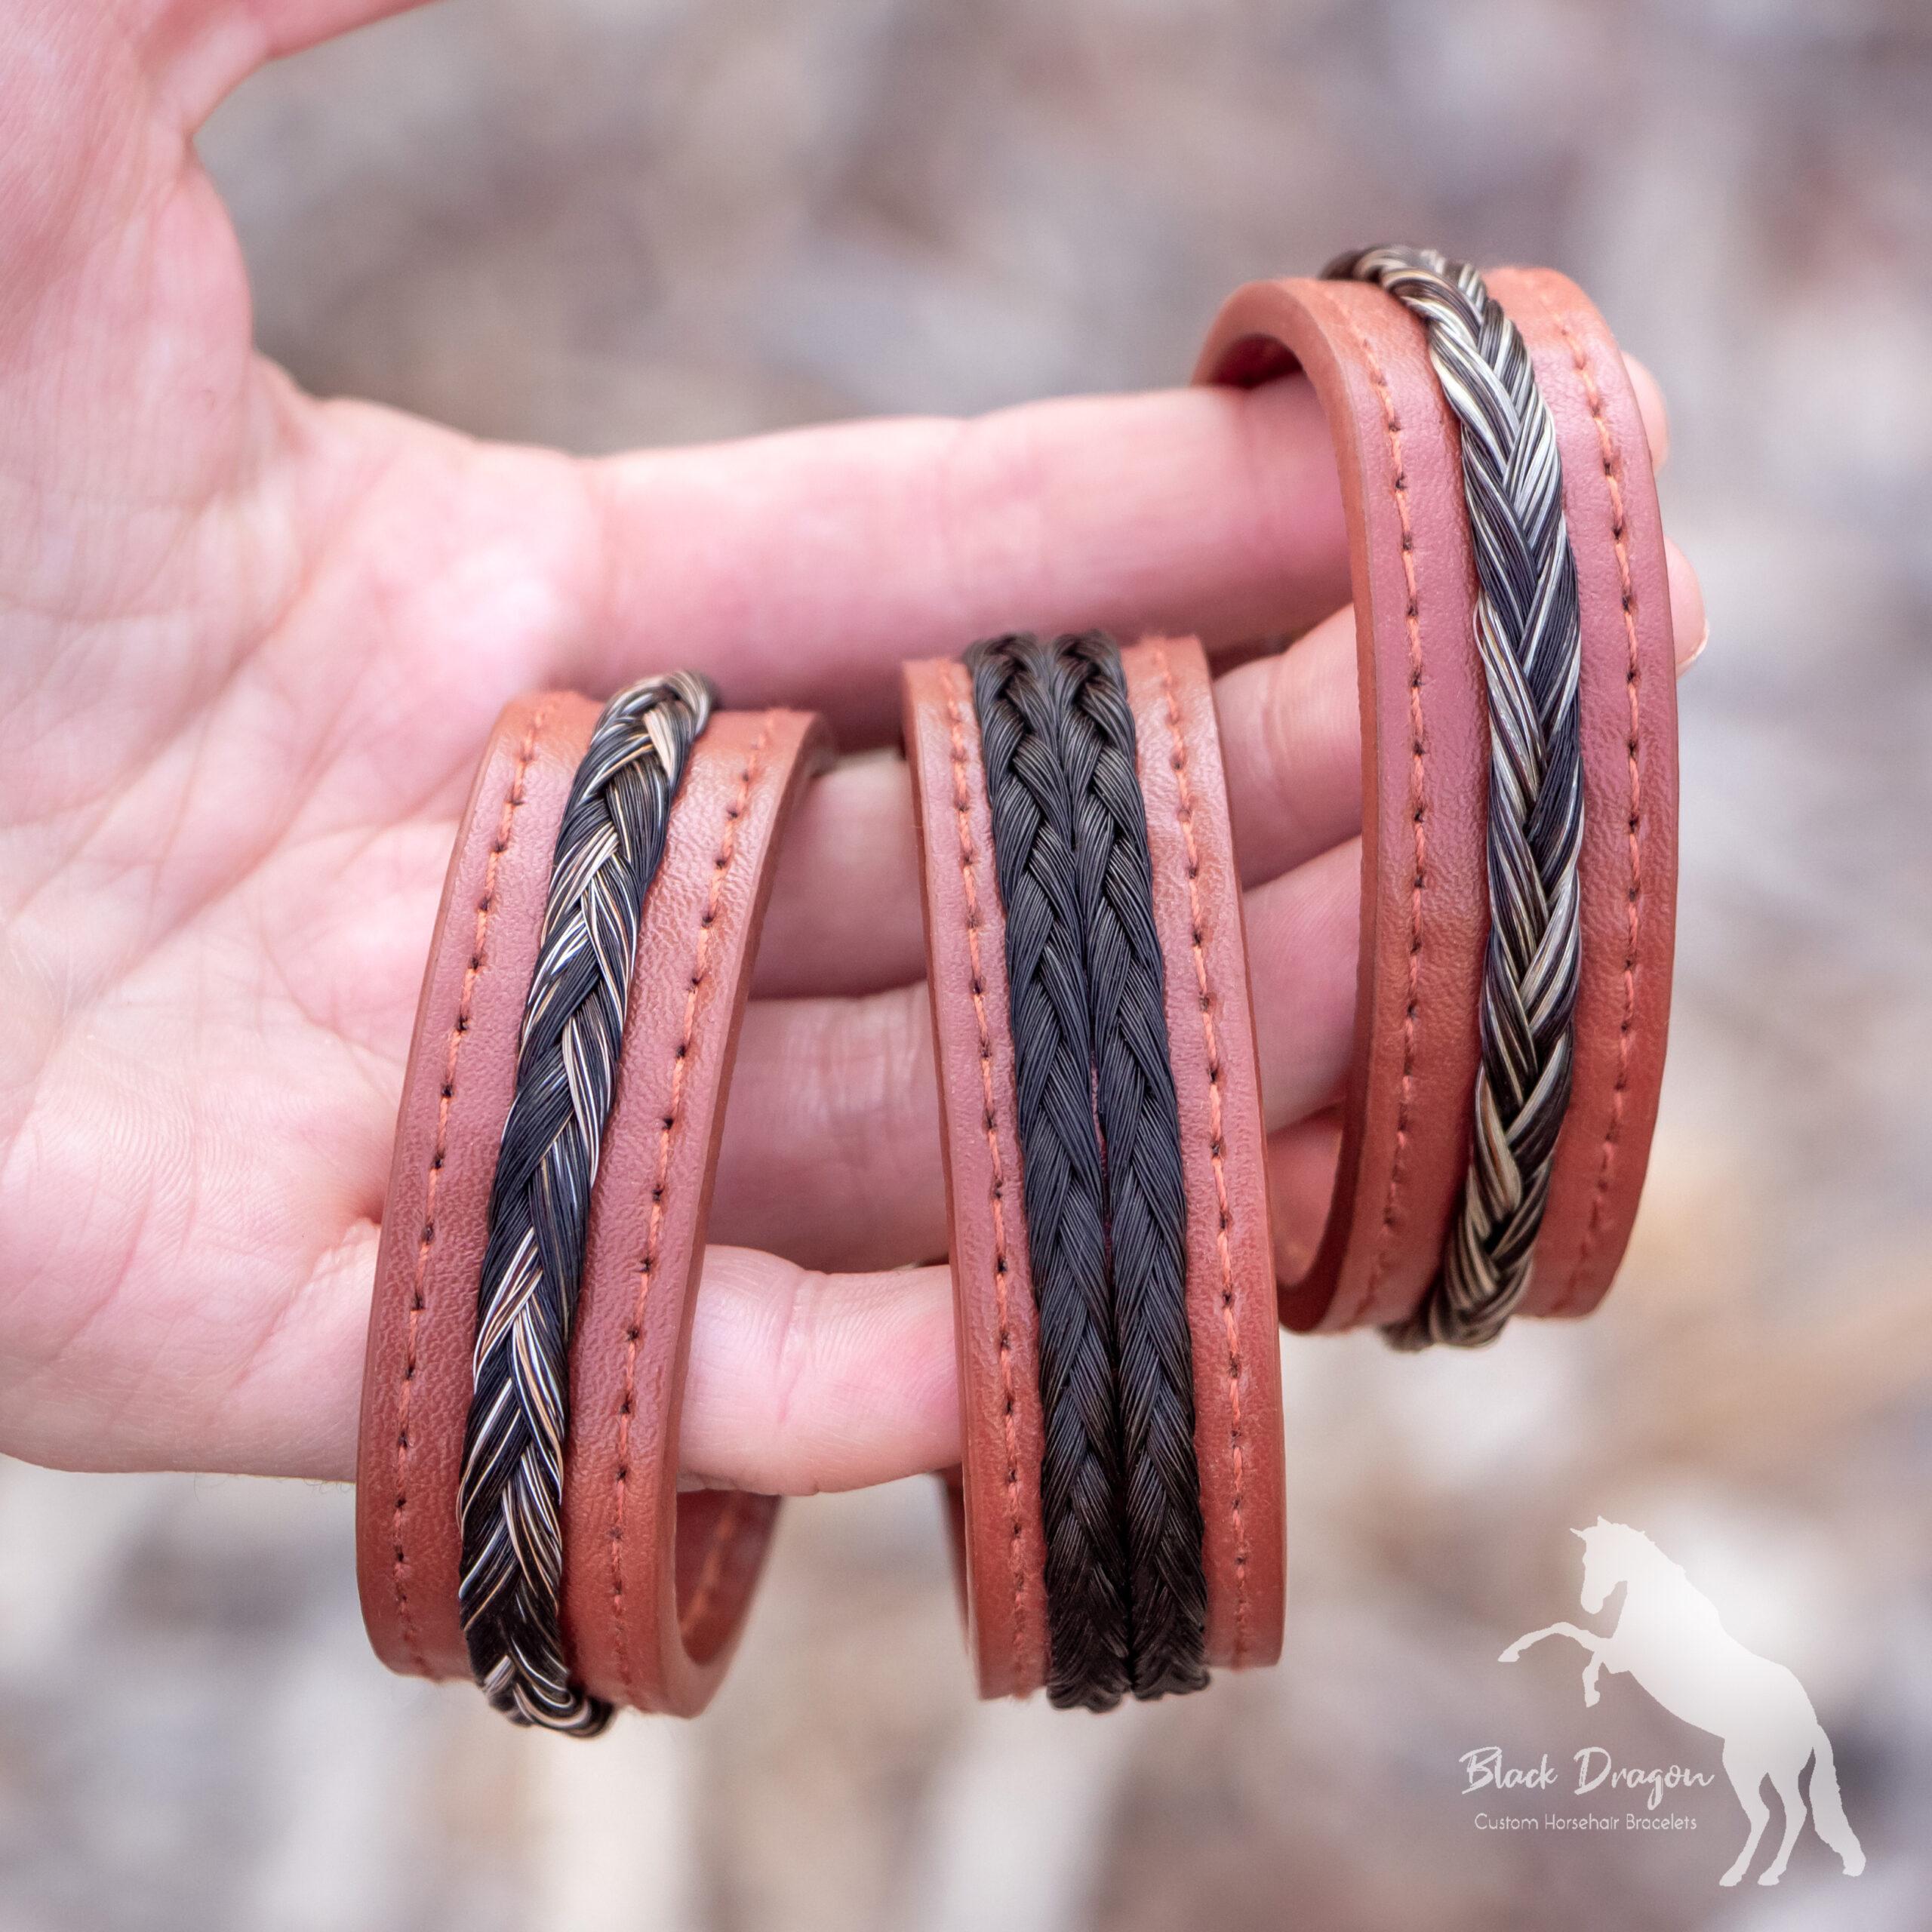 Hand holding three cognac leather horsehair bracelets